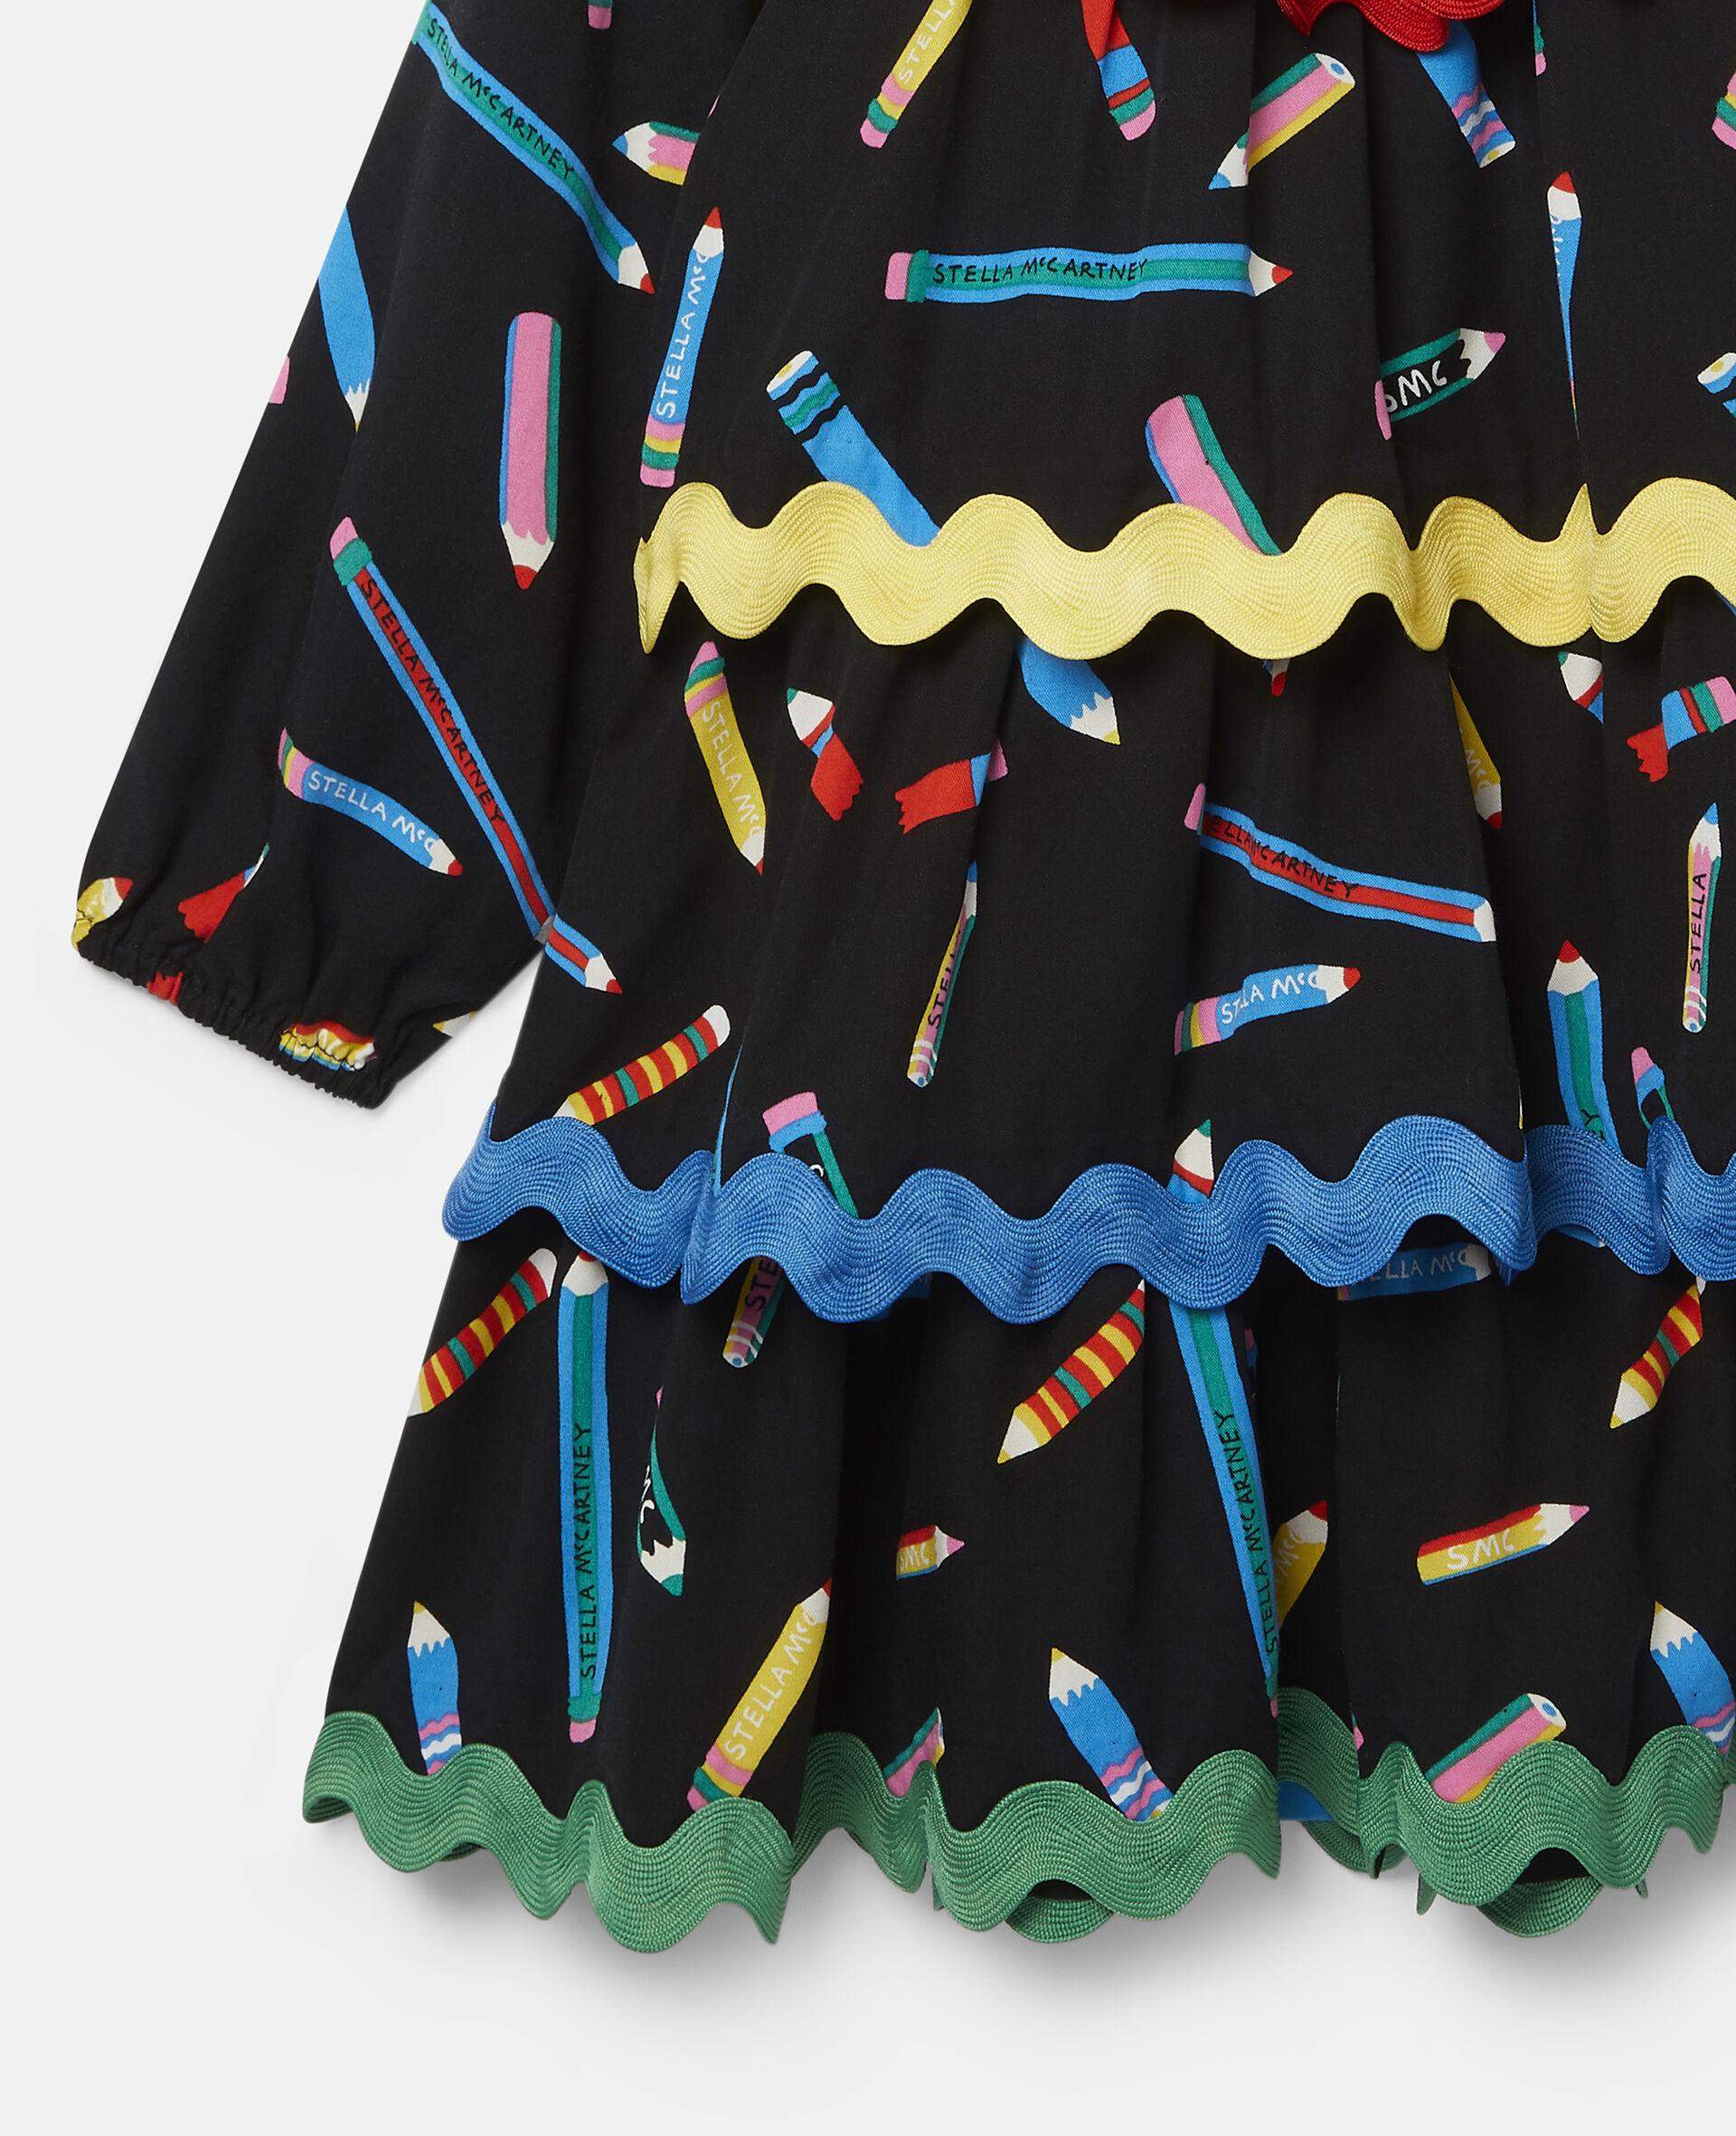 铅笔印花分层斜纹布连衣裙 -黑色-large image number 1